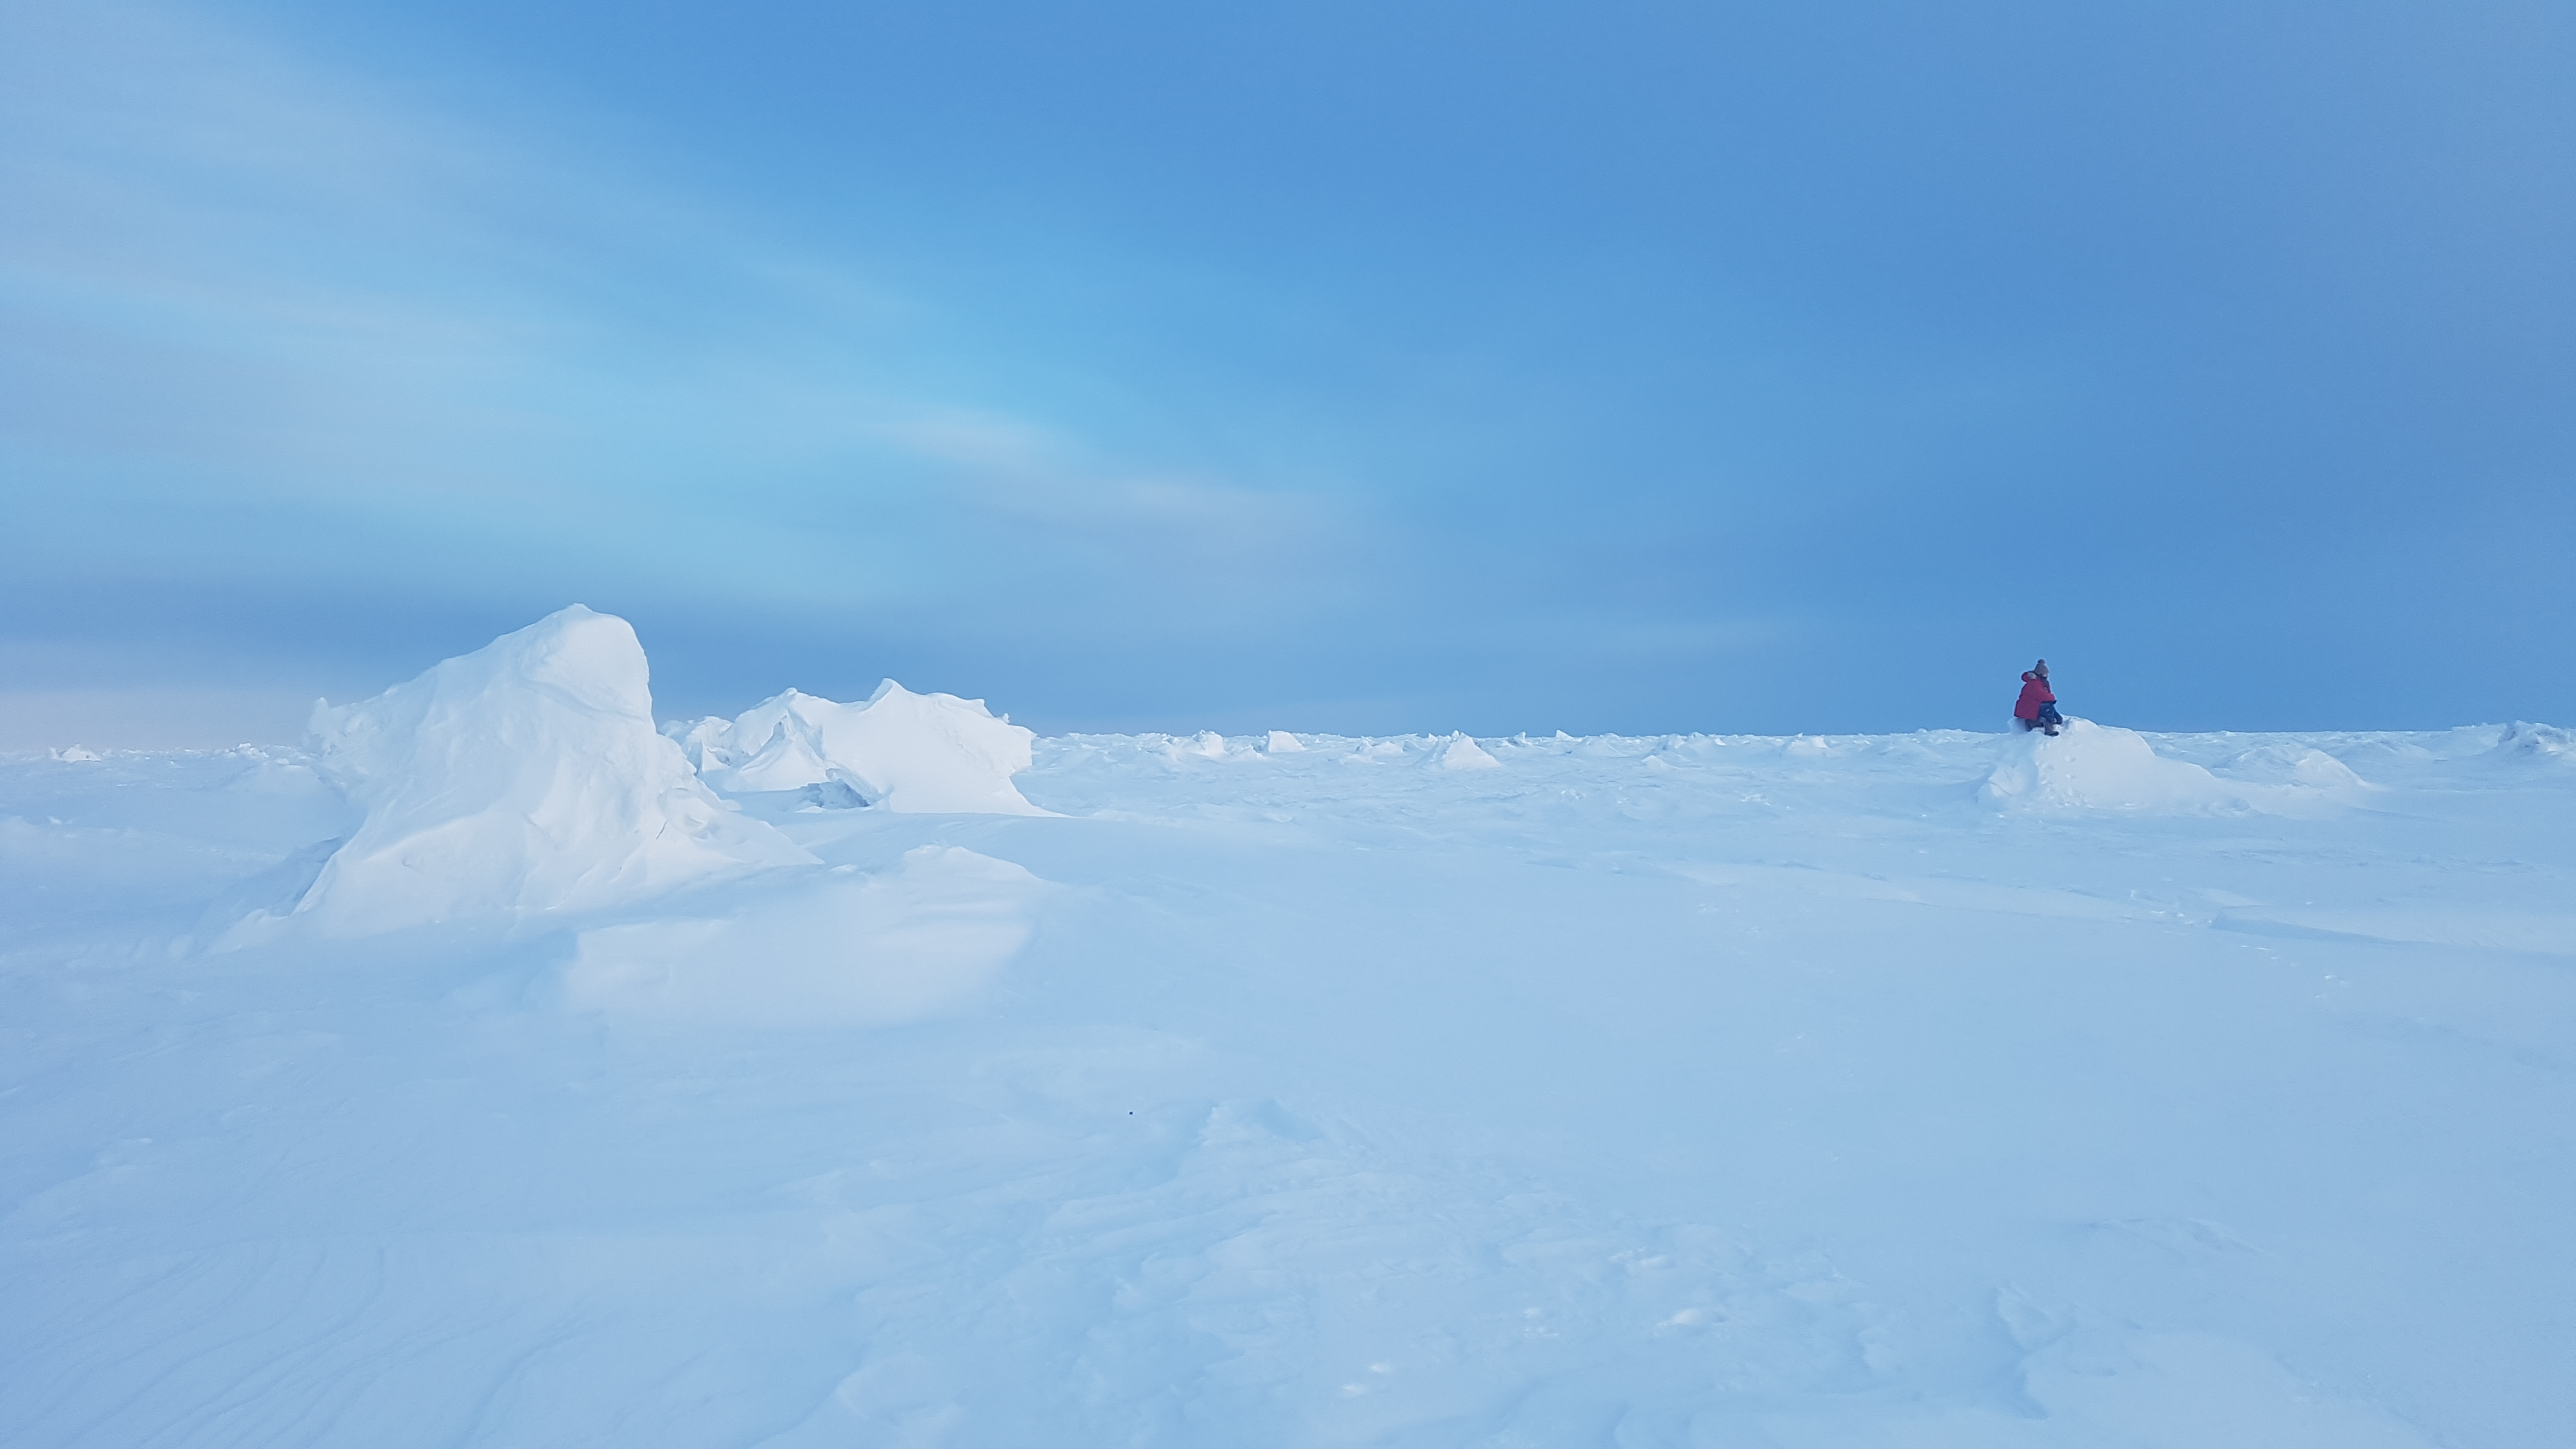 Britt looking out over the Hudson bay sea ice near Churchill Manitoba, Canada